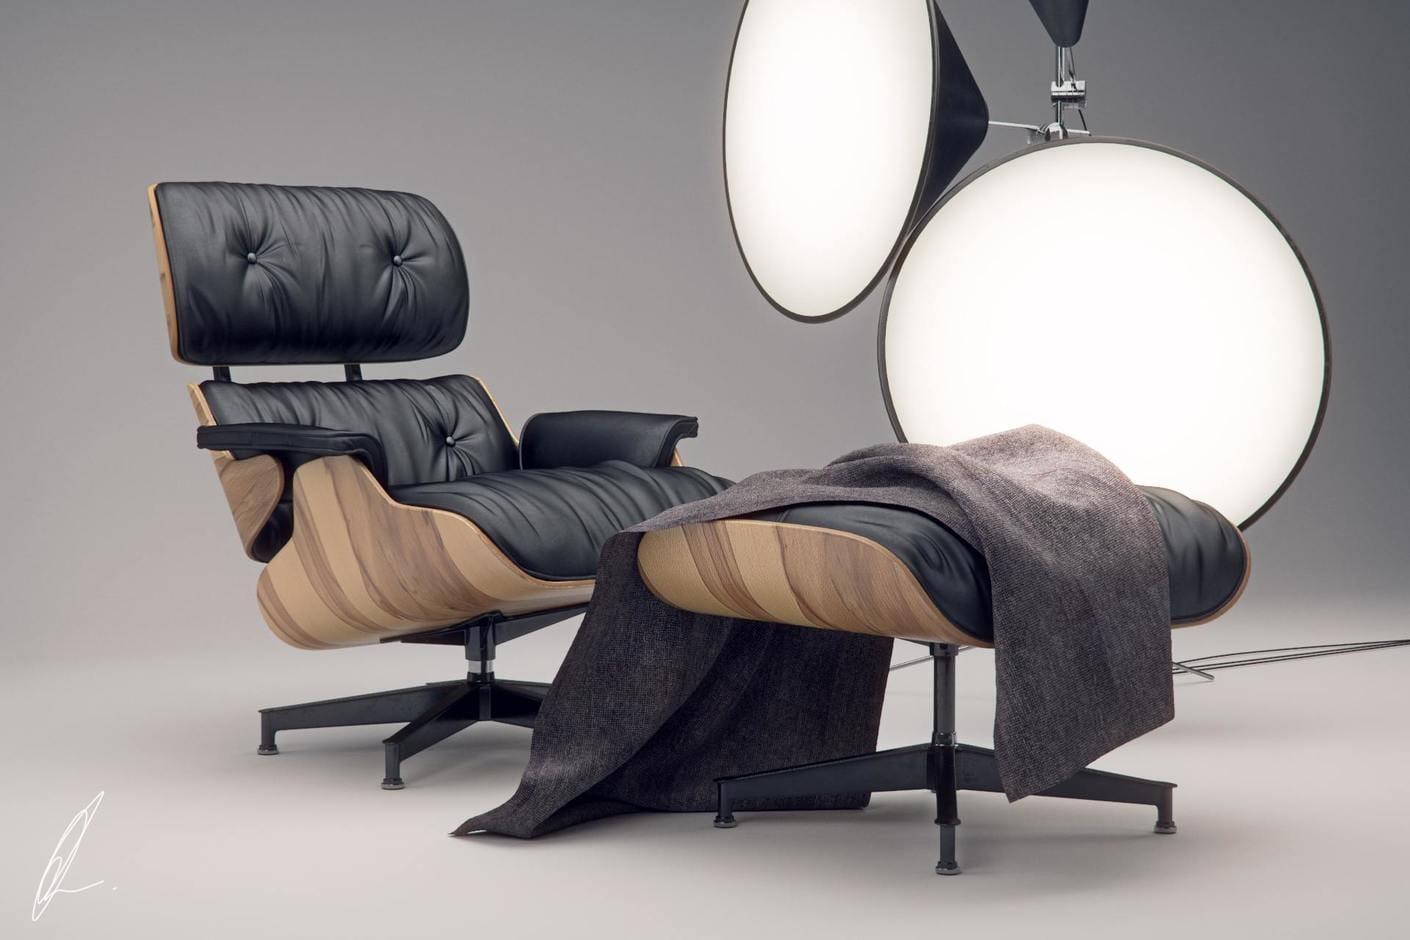 eames lounge chair – jonathan evans | chaos group